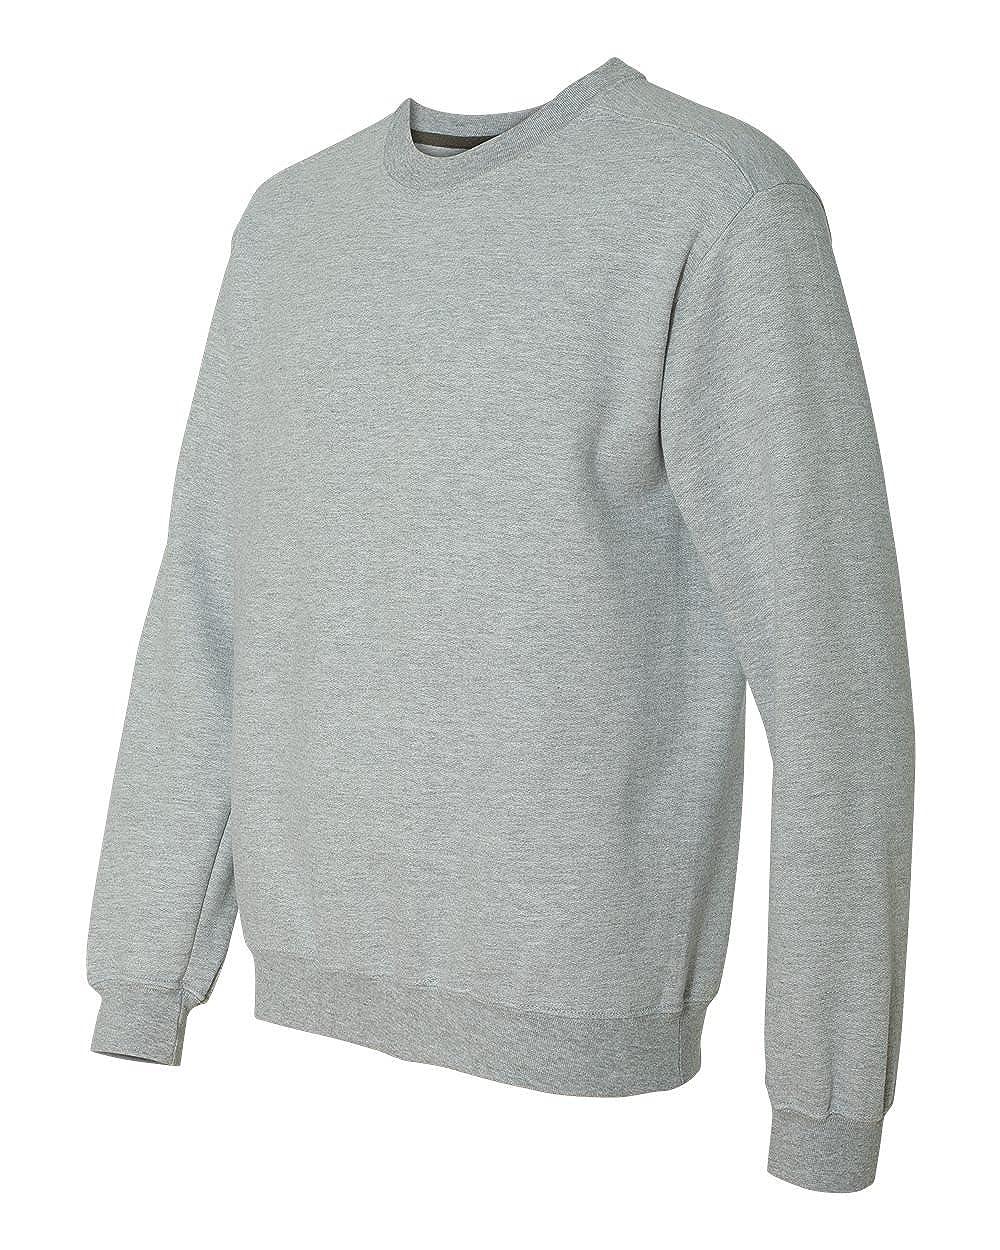 G920 Gildan Mens Premium Cotton 9 Oz ,Sport Grey-Small Ringspun Crew